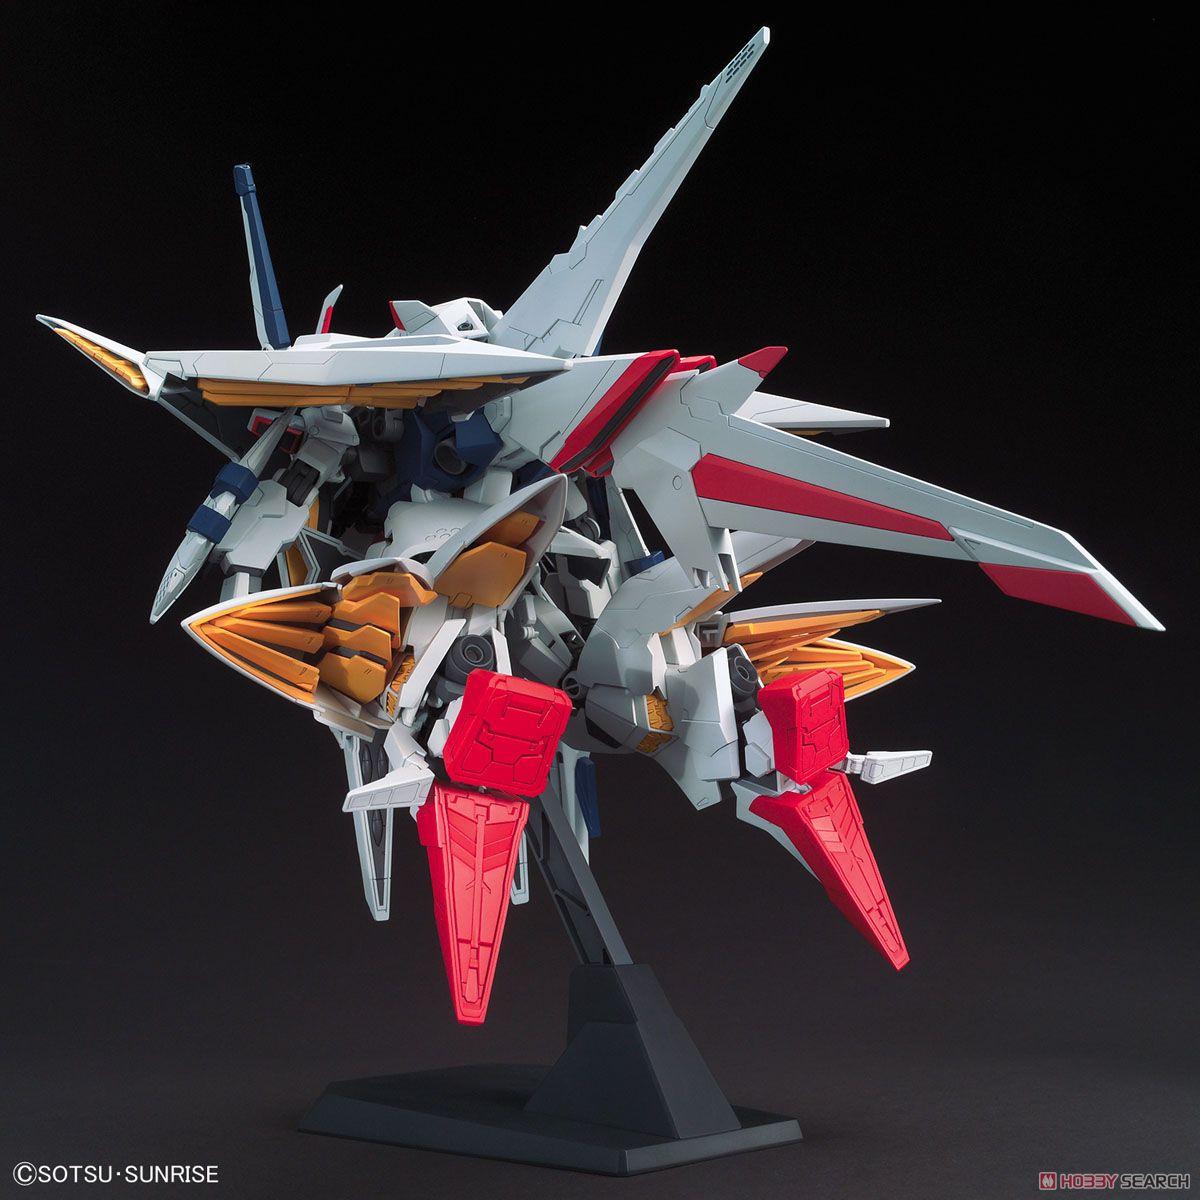 HGUC 1/144『ペーネロペー』機動戦士ガンダム 閃光のハサウェイ プラモデル-004